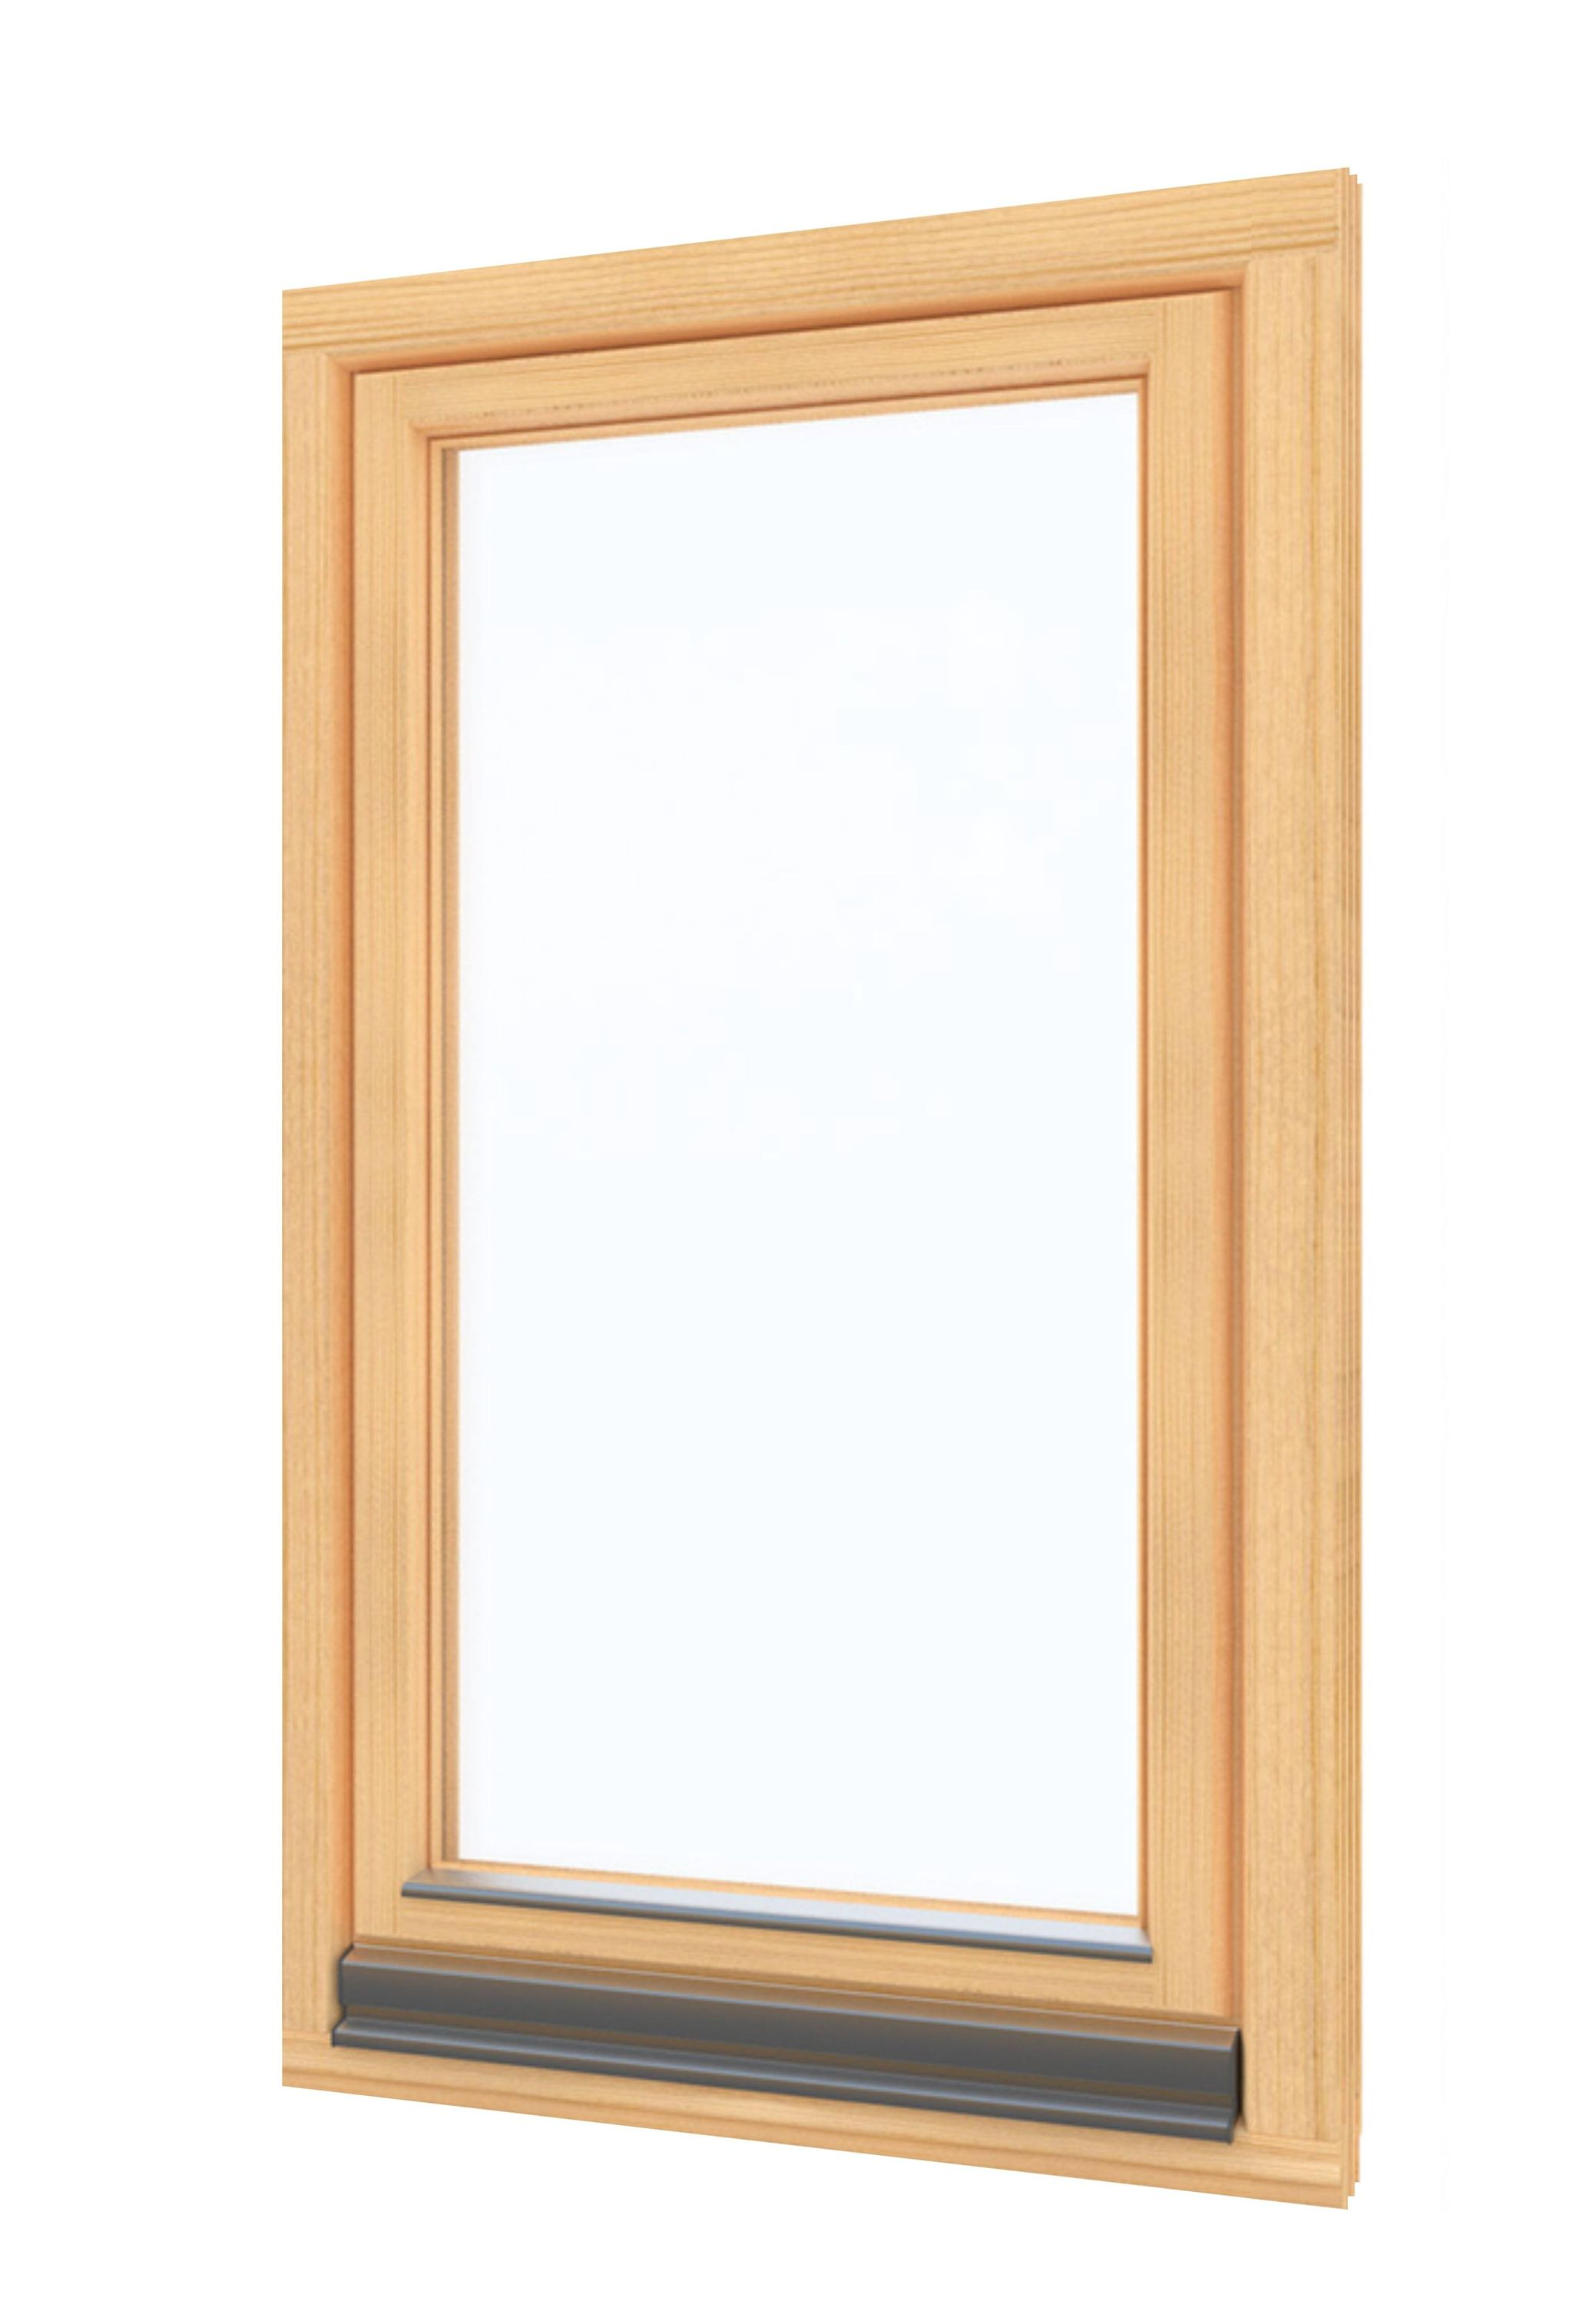 Okno SCHS 92 Integral